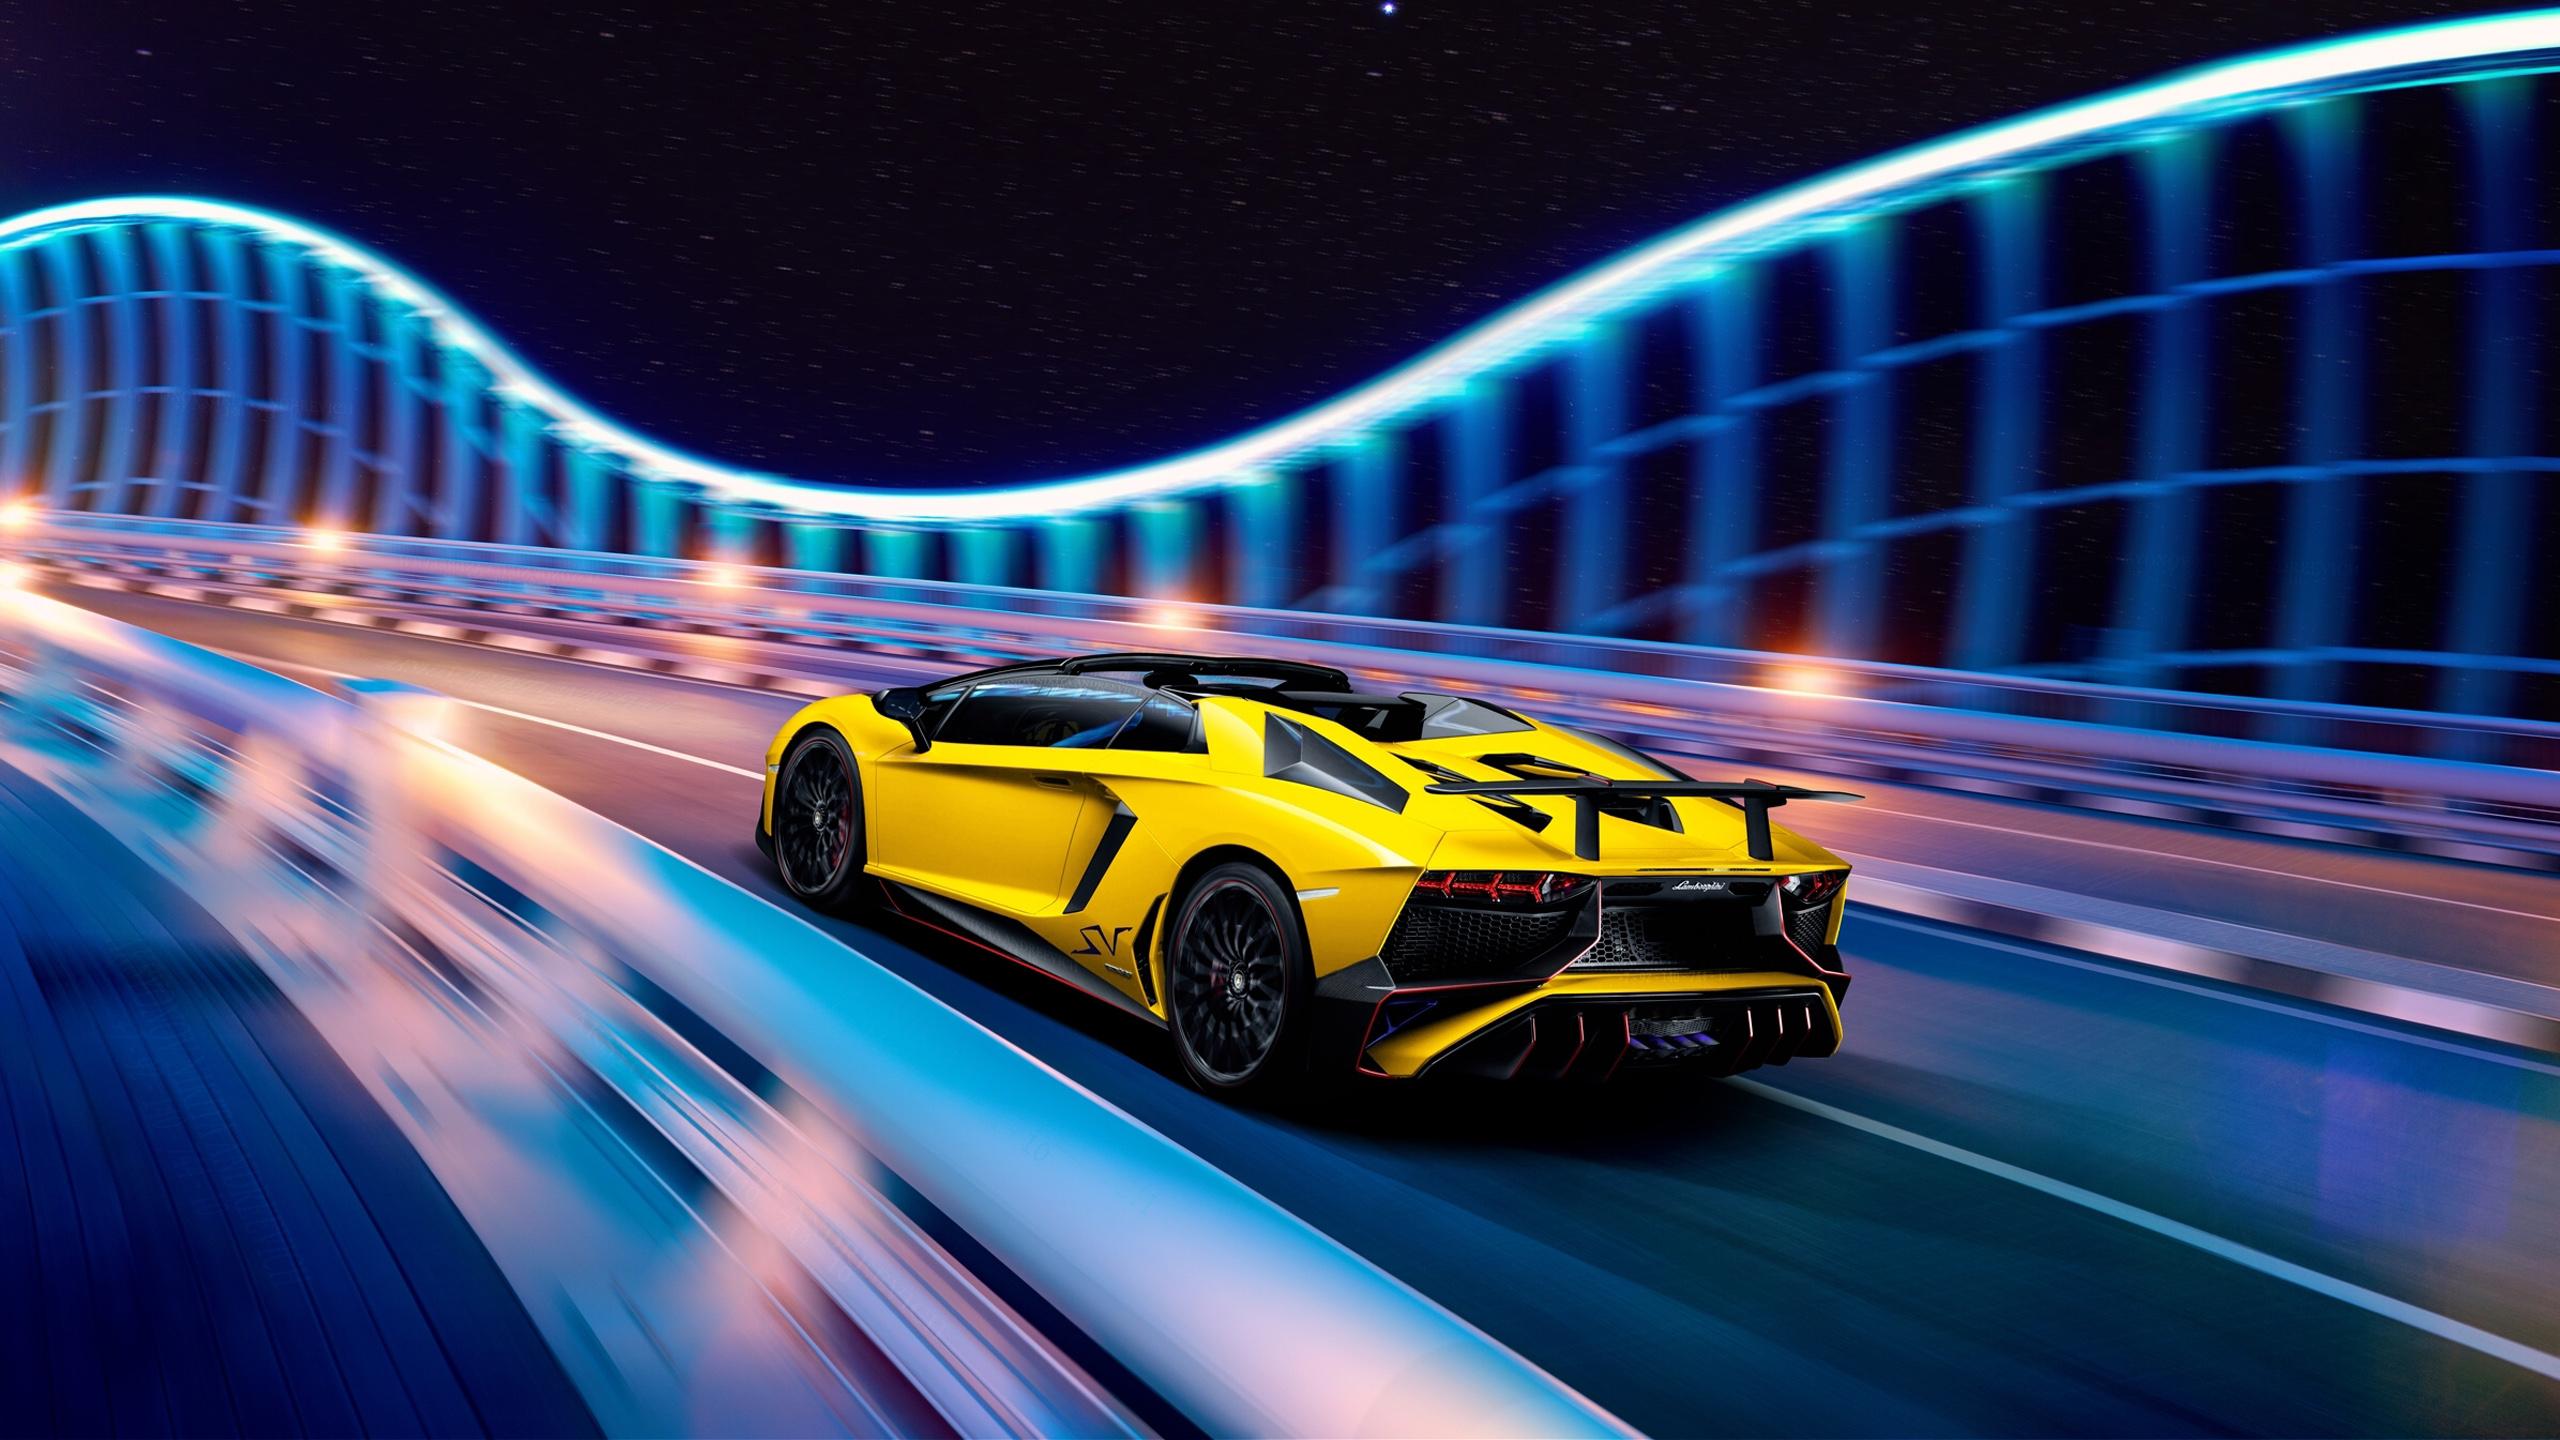 Lamborghini Aventador 2016 HD Cars 4k Wallpapers Images